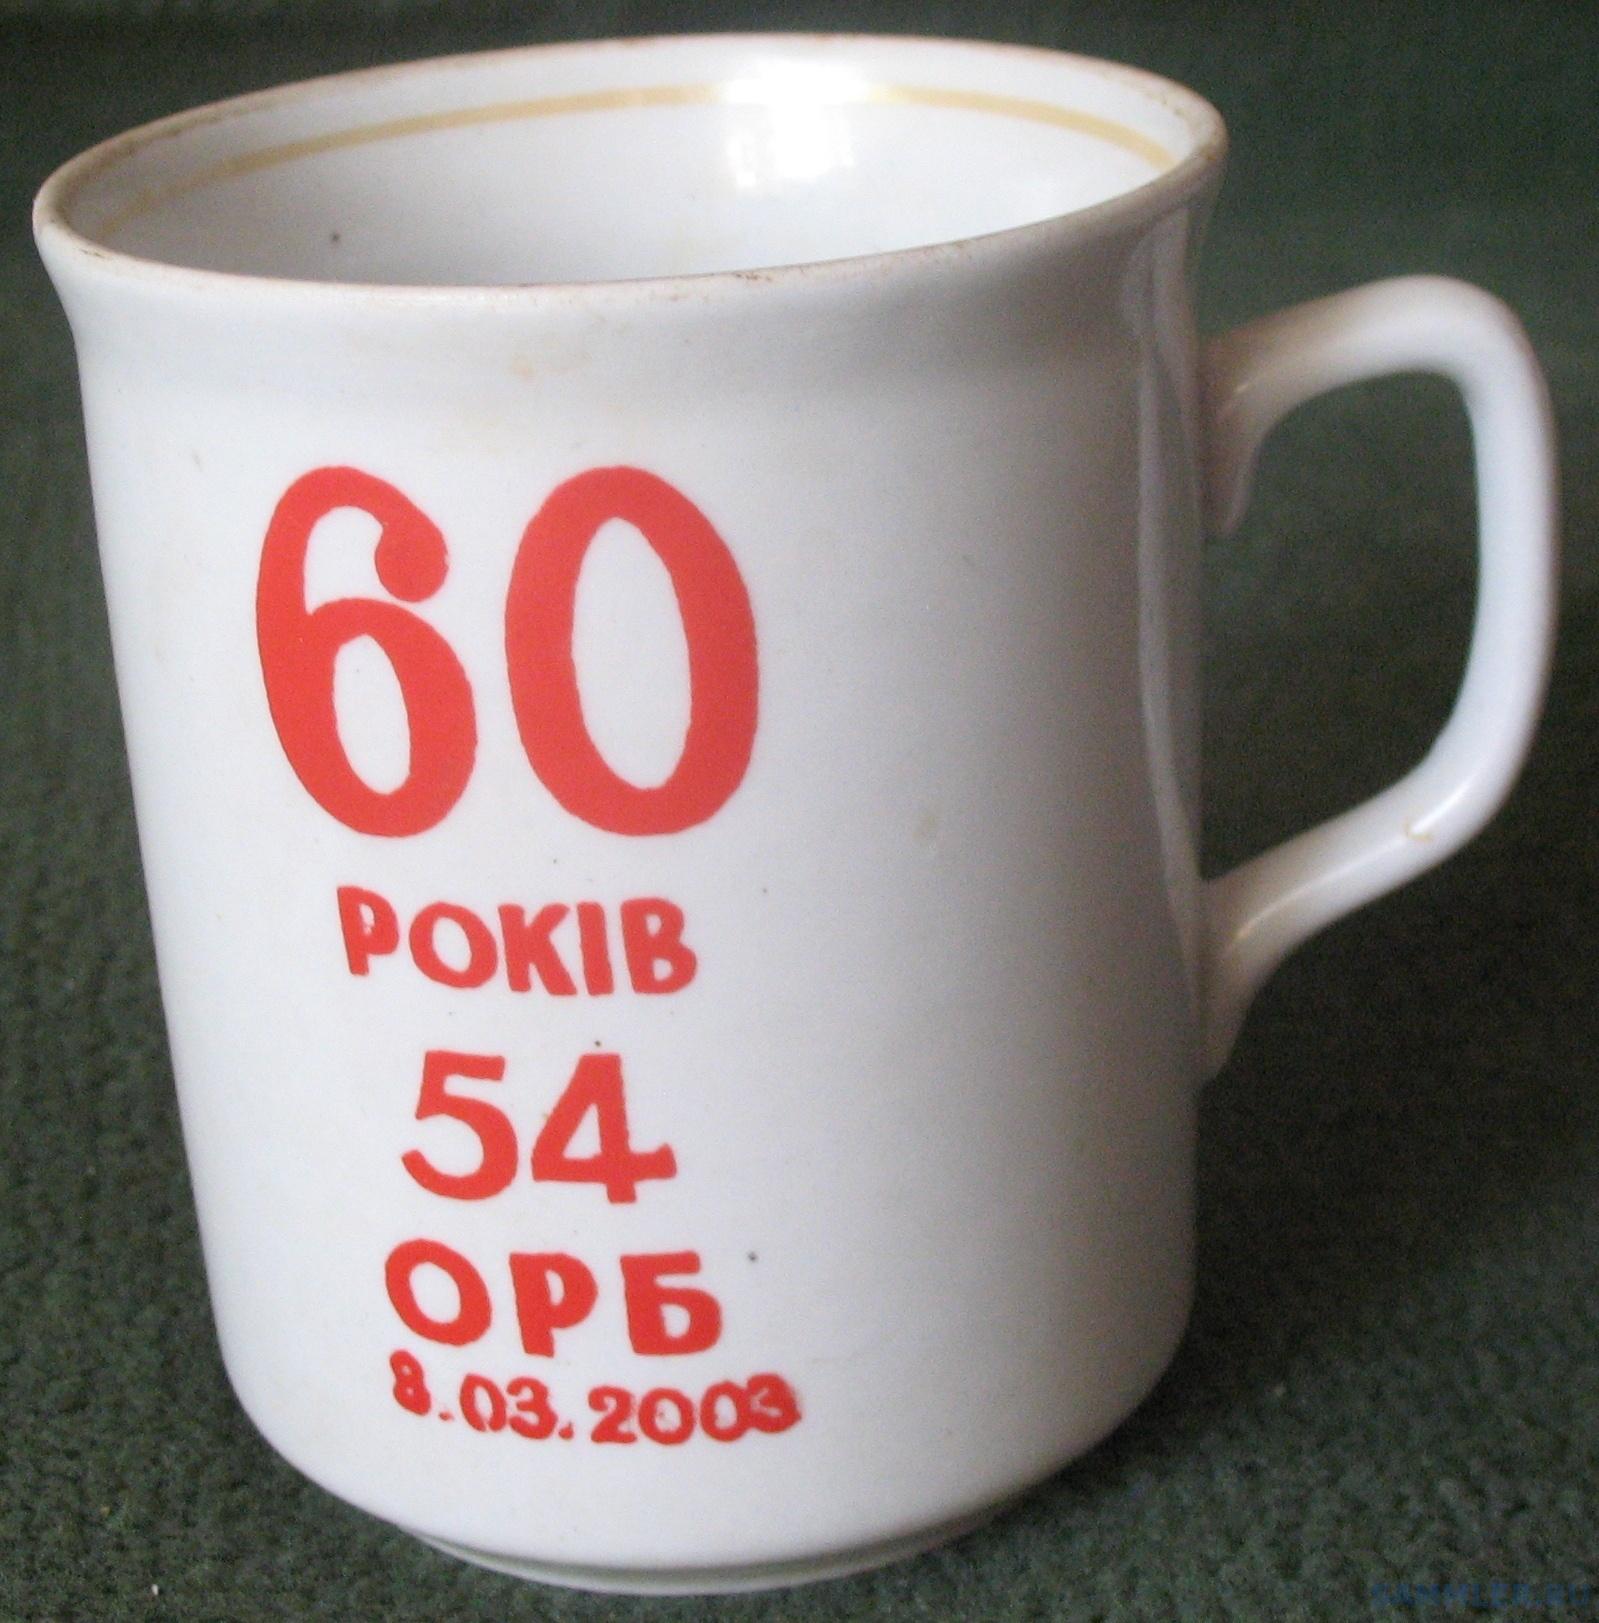 Укр 54орб 60 1.jpg